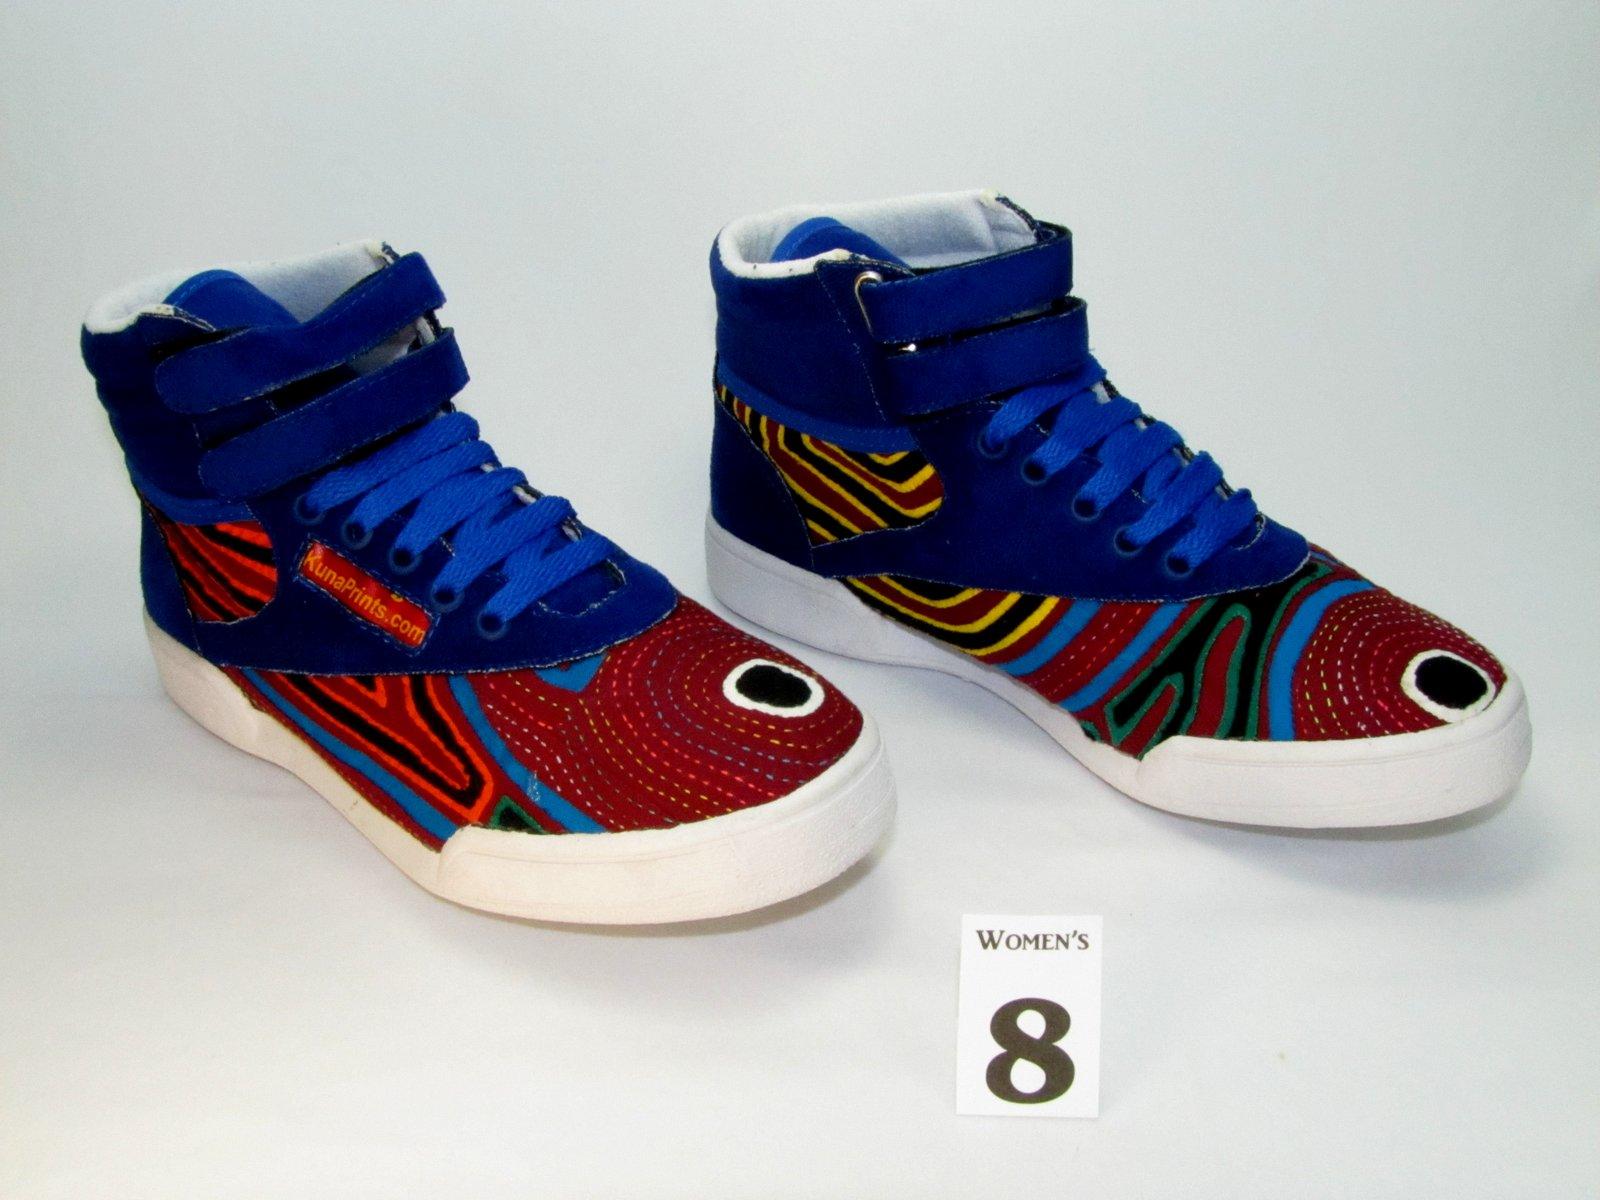 Buy Mola Shoes